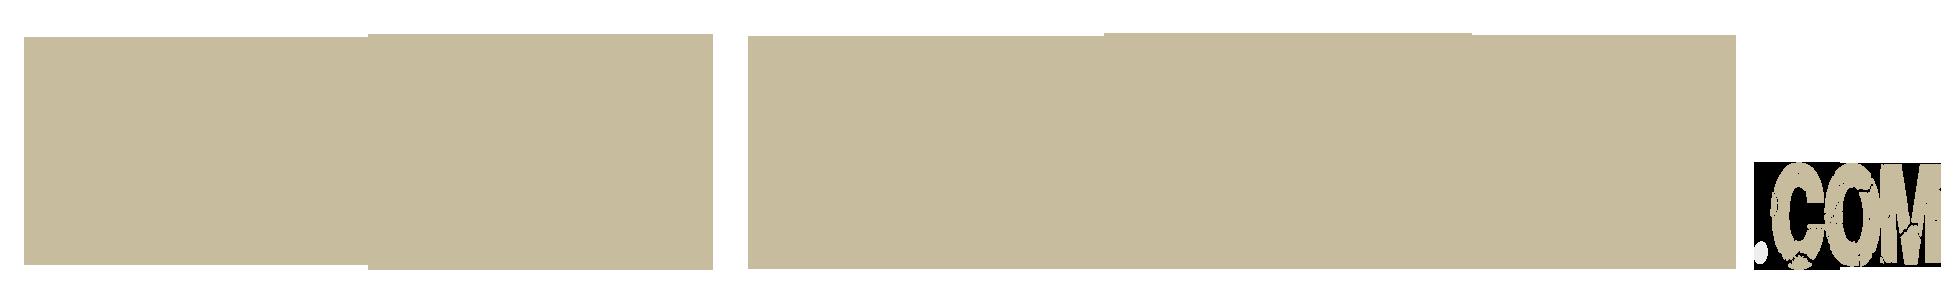 Sortie-randos-moto-enduro-beaujolais